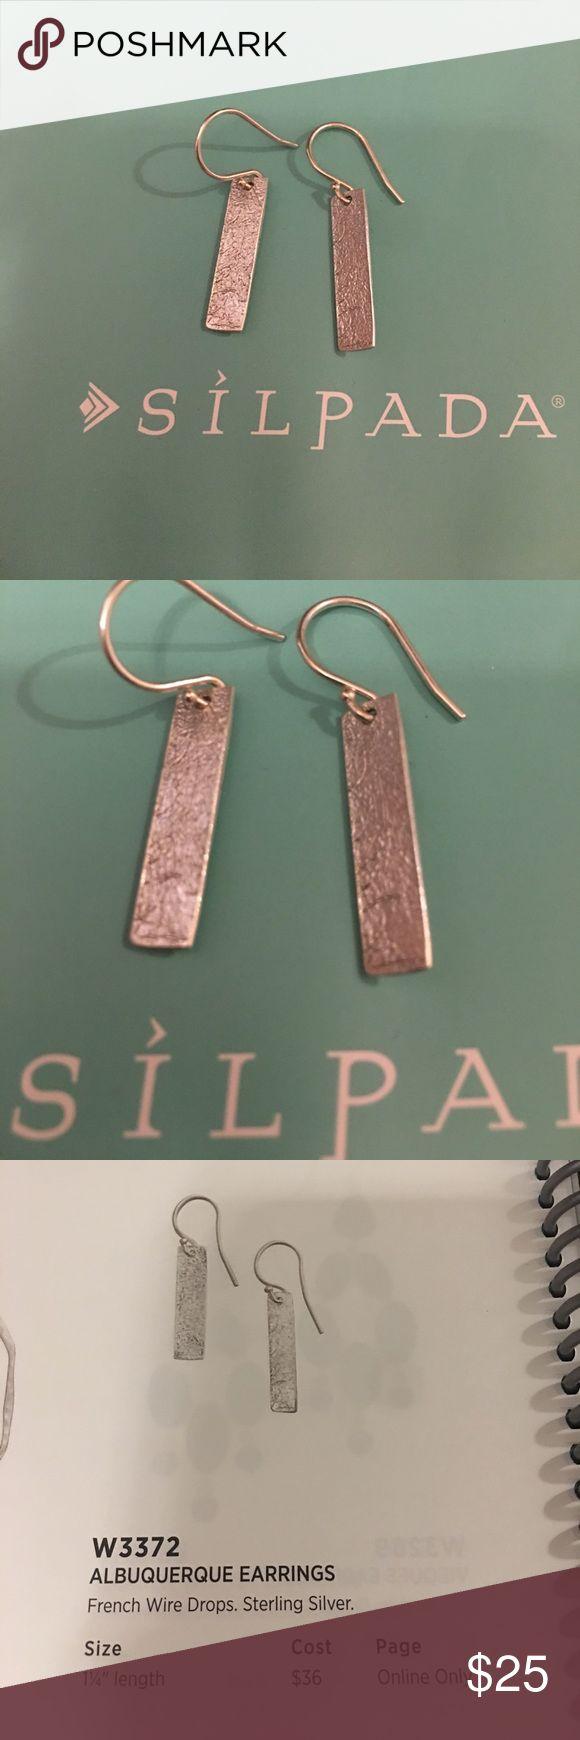 Silpada designs Albuquerque earrings sterling Silpada designs Albuquerque earrings sterling silver. New never worn. Silpada Jewelry Earrings